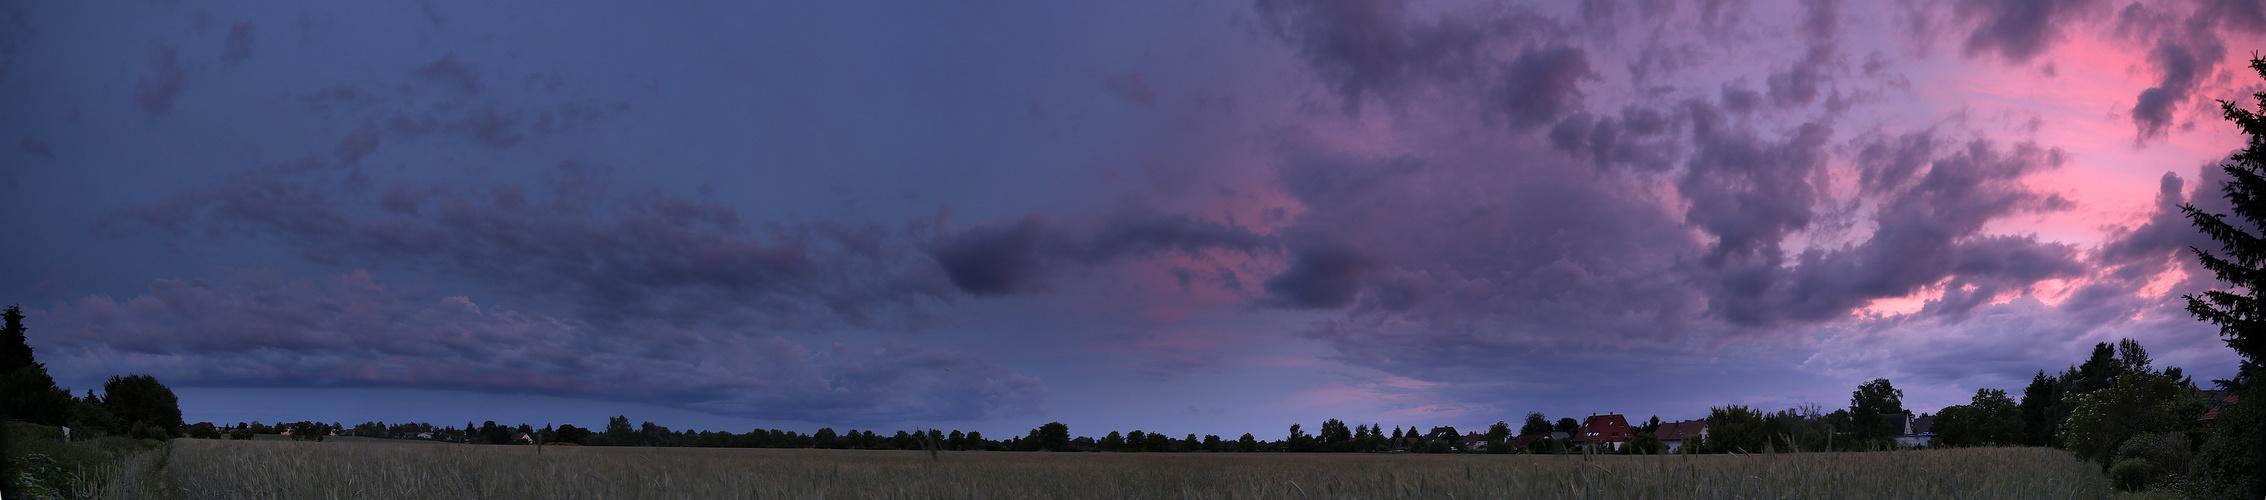 Blaue Stunde über dem Feld